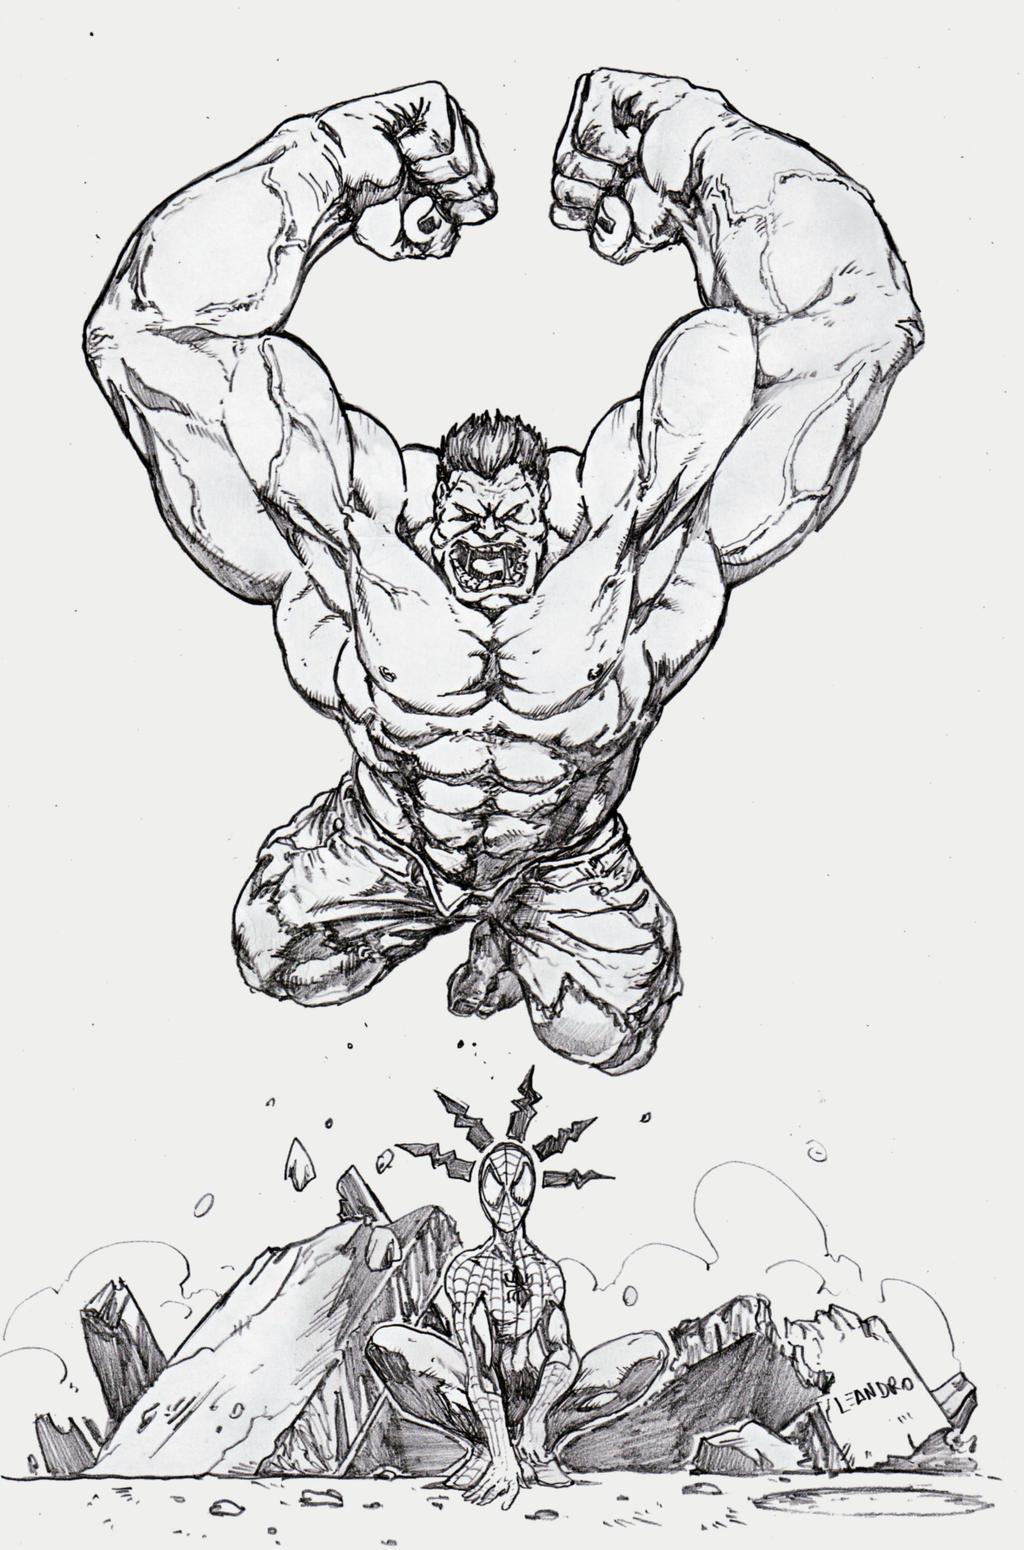 Hulk Smash by lorkalt on DeviantArt